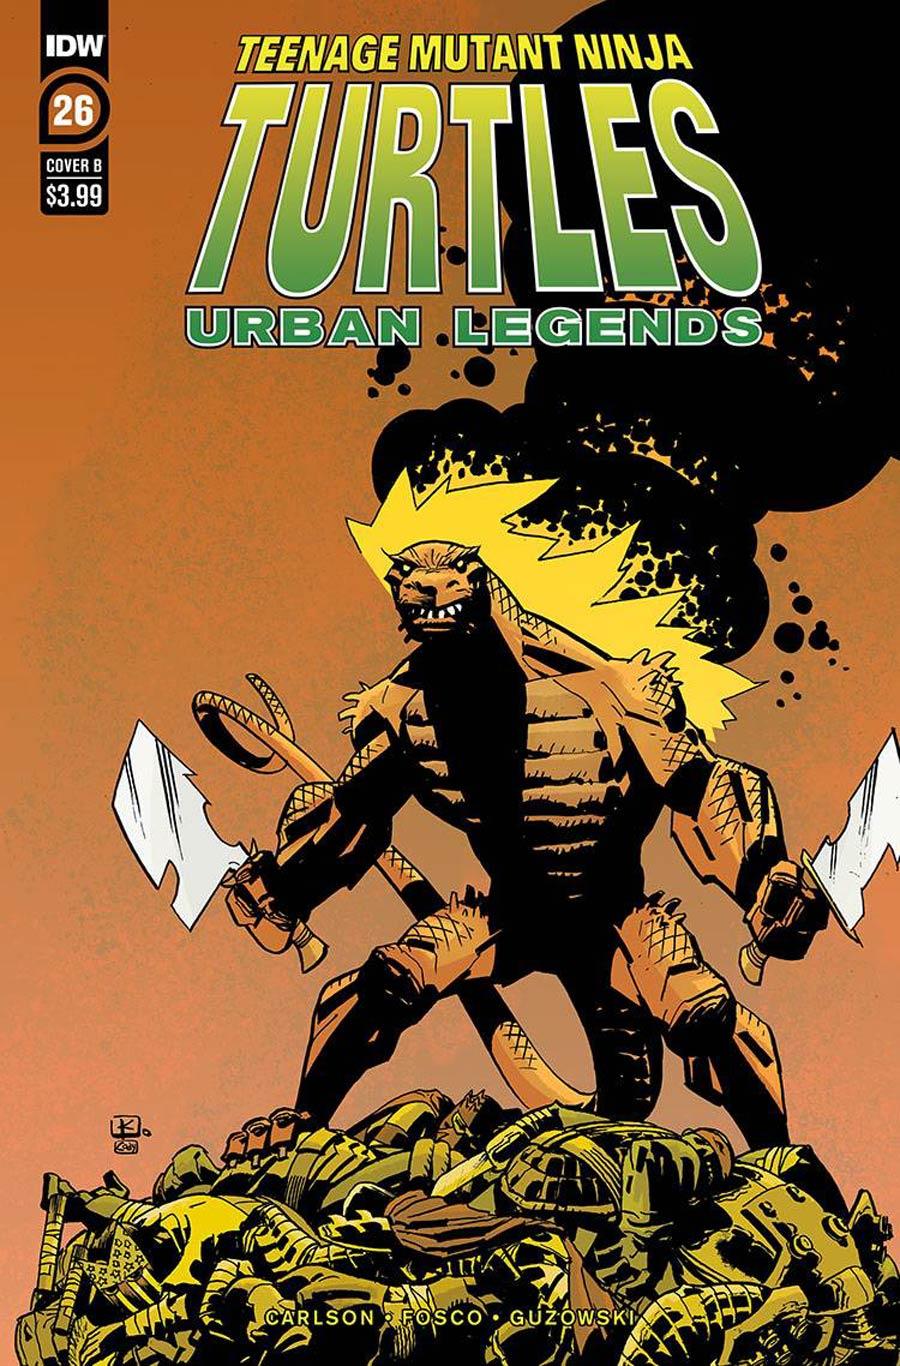 Teenage Mutant Ninja Turtles Urban Legends #26 Cover B Variant Andy Kuhn Cover